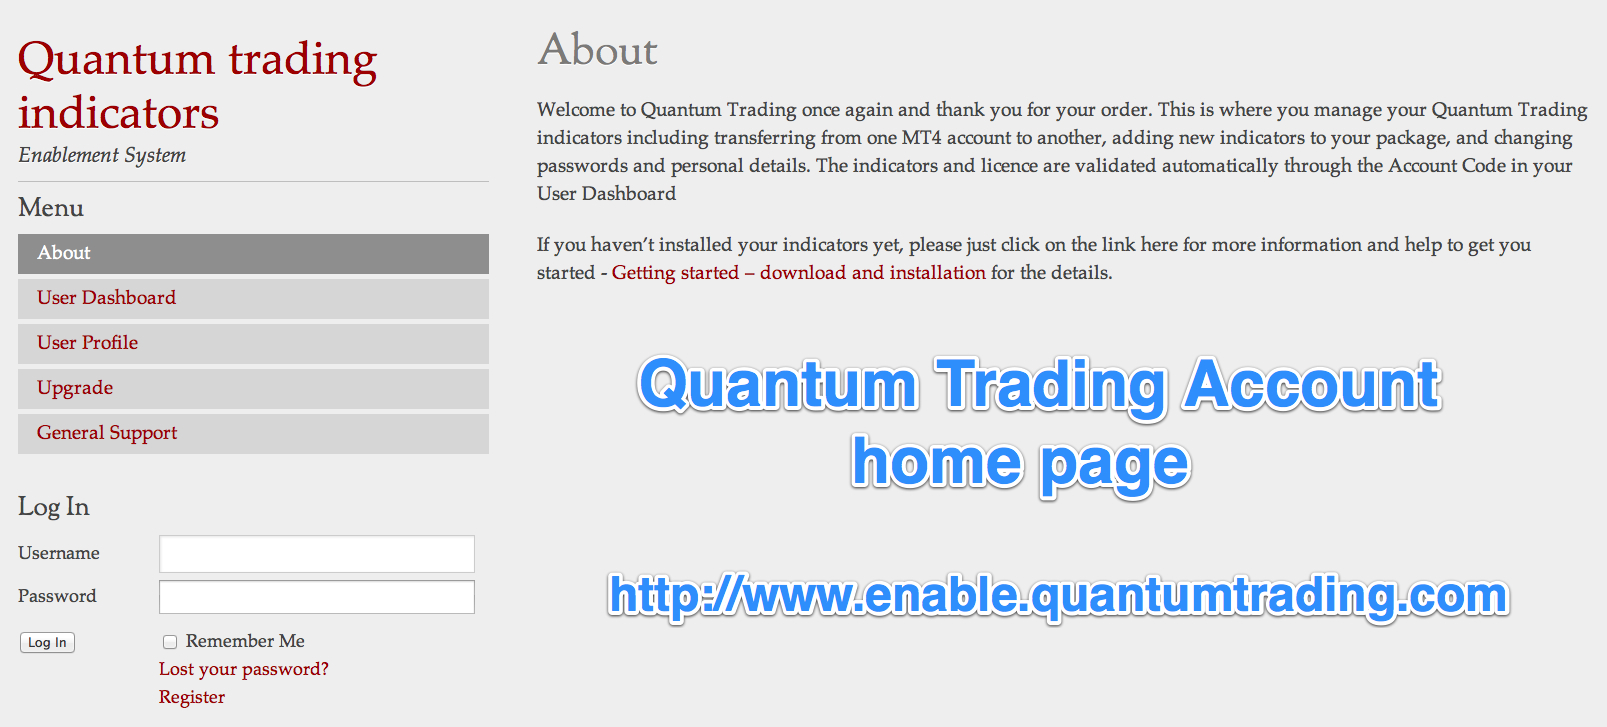 Quantum Trading Home Page - JPG